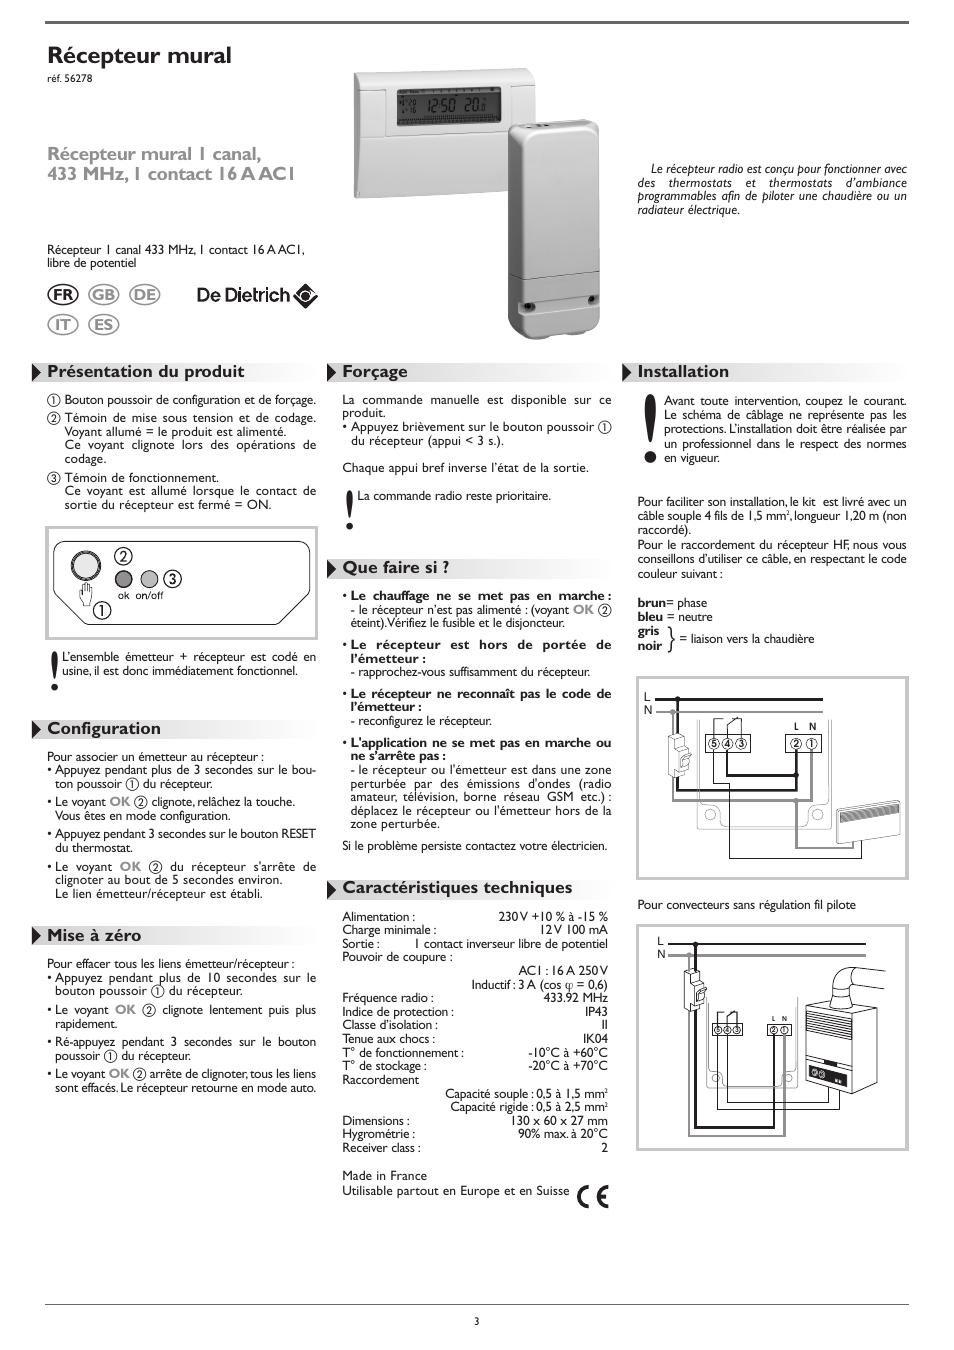 r cepteur mural de dietrich ad248 thermostat user manual page 3 20. Black Bedroom Furniture Sets. Home Design Ideas